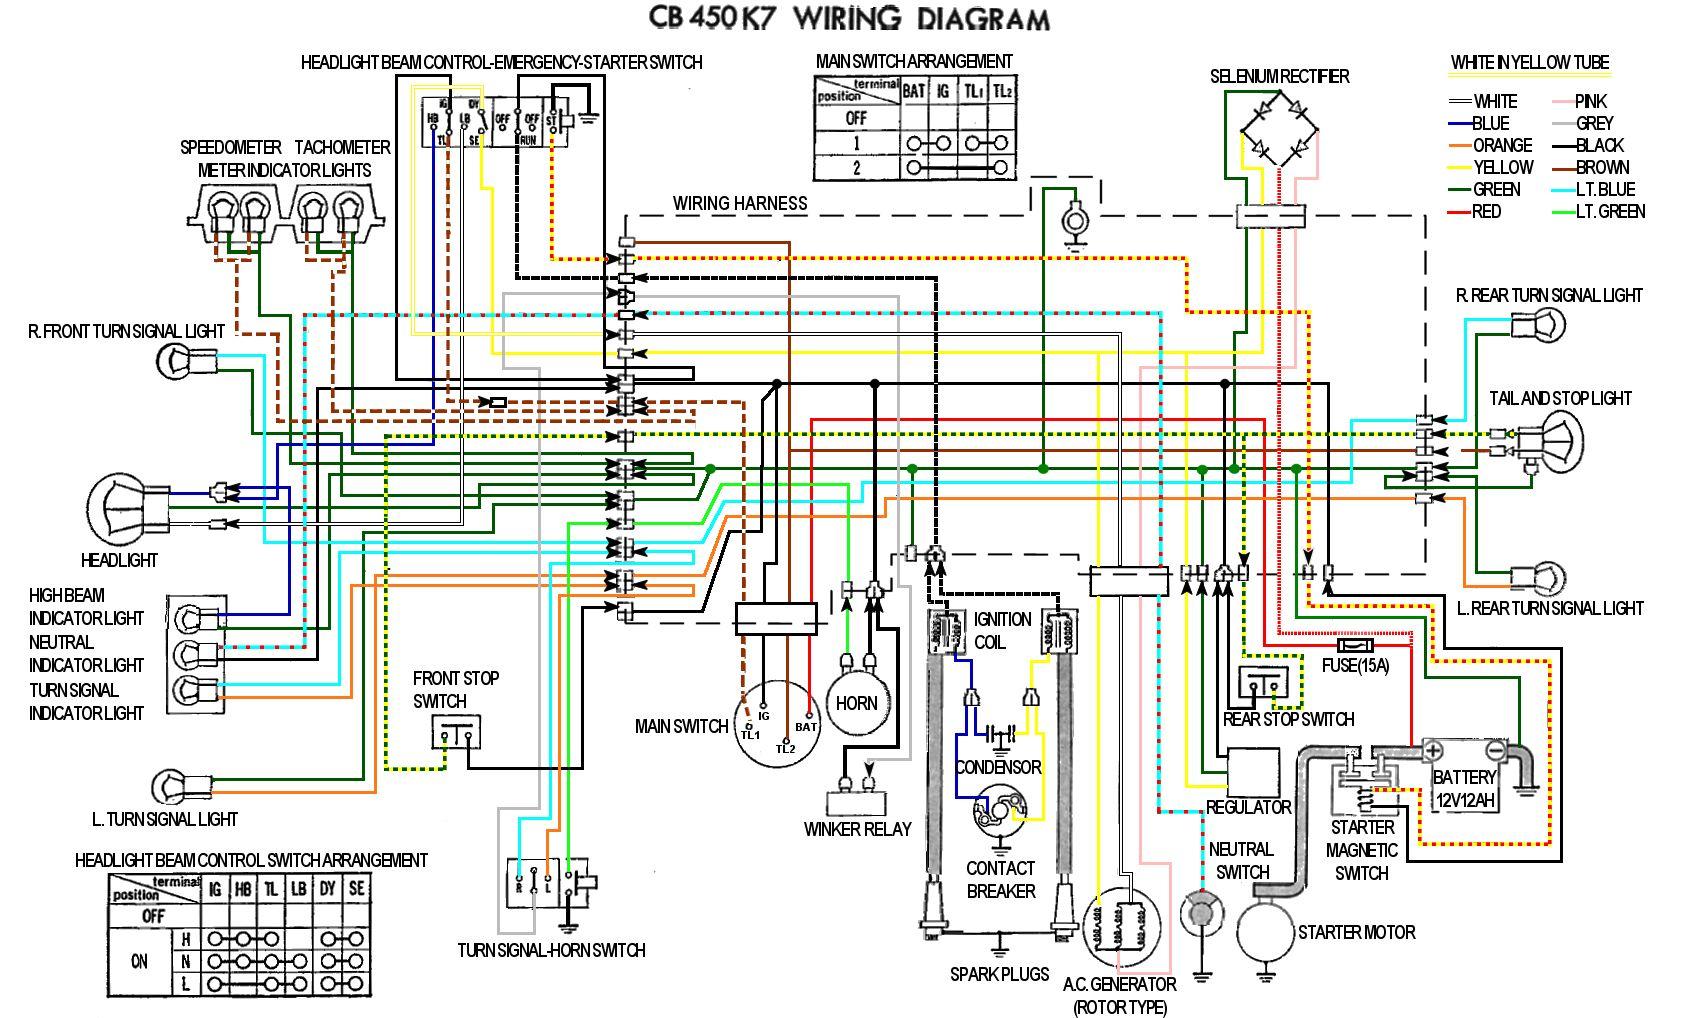 Honda Recon 250 Regulator Rectifier Wiring Diagram Electrical Cb 750 Schematic Diagrams Atv